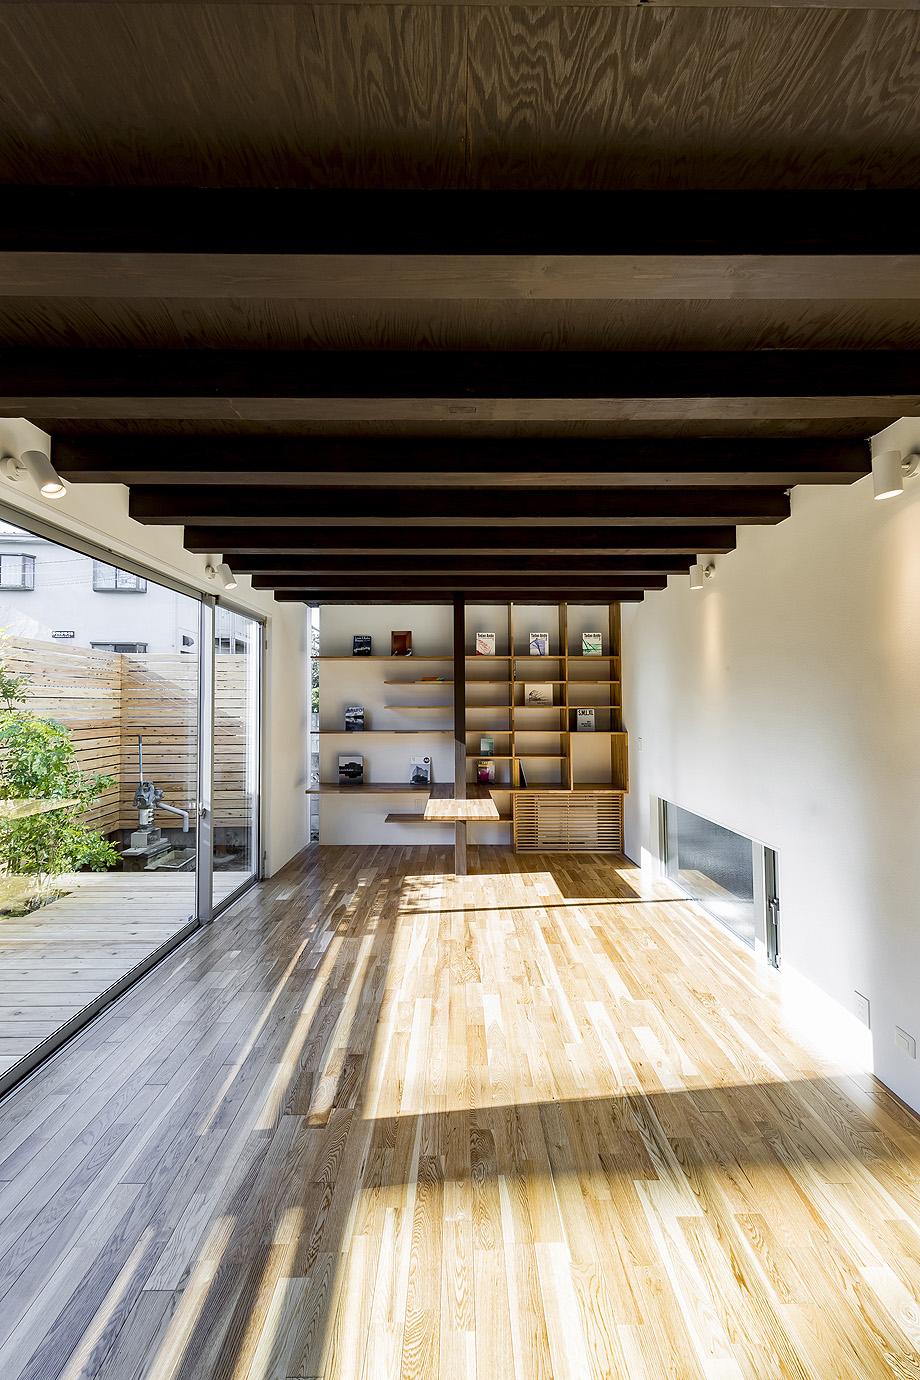 casa n de yds architects - foto nobuki taoka (15)